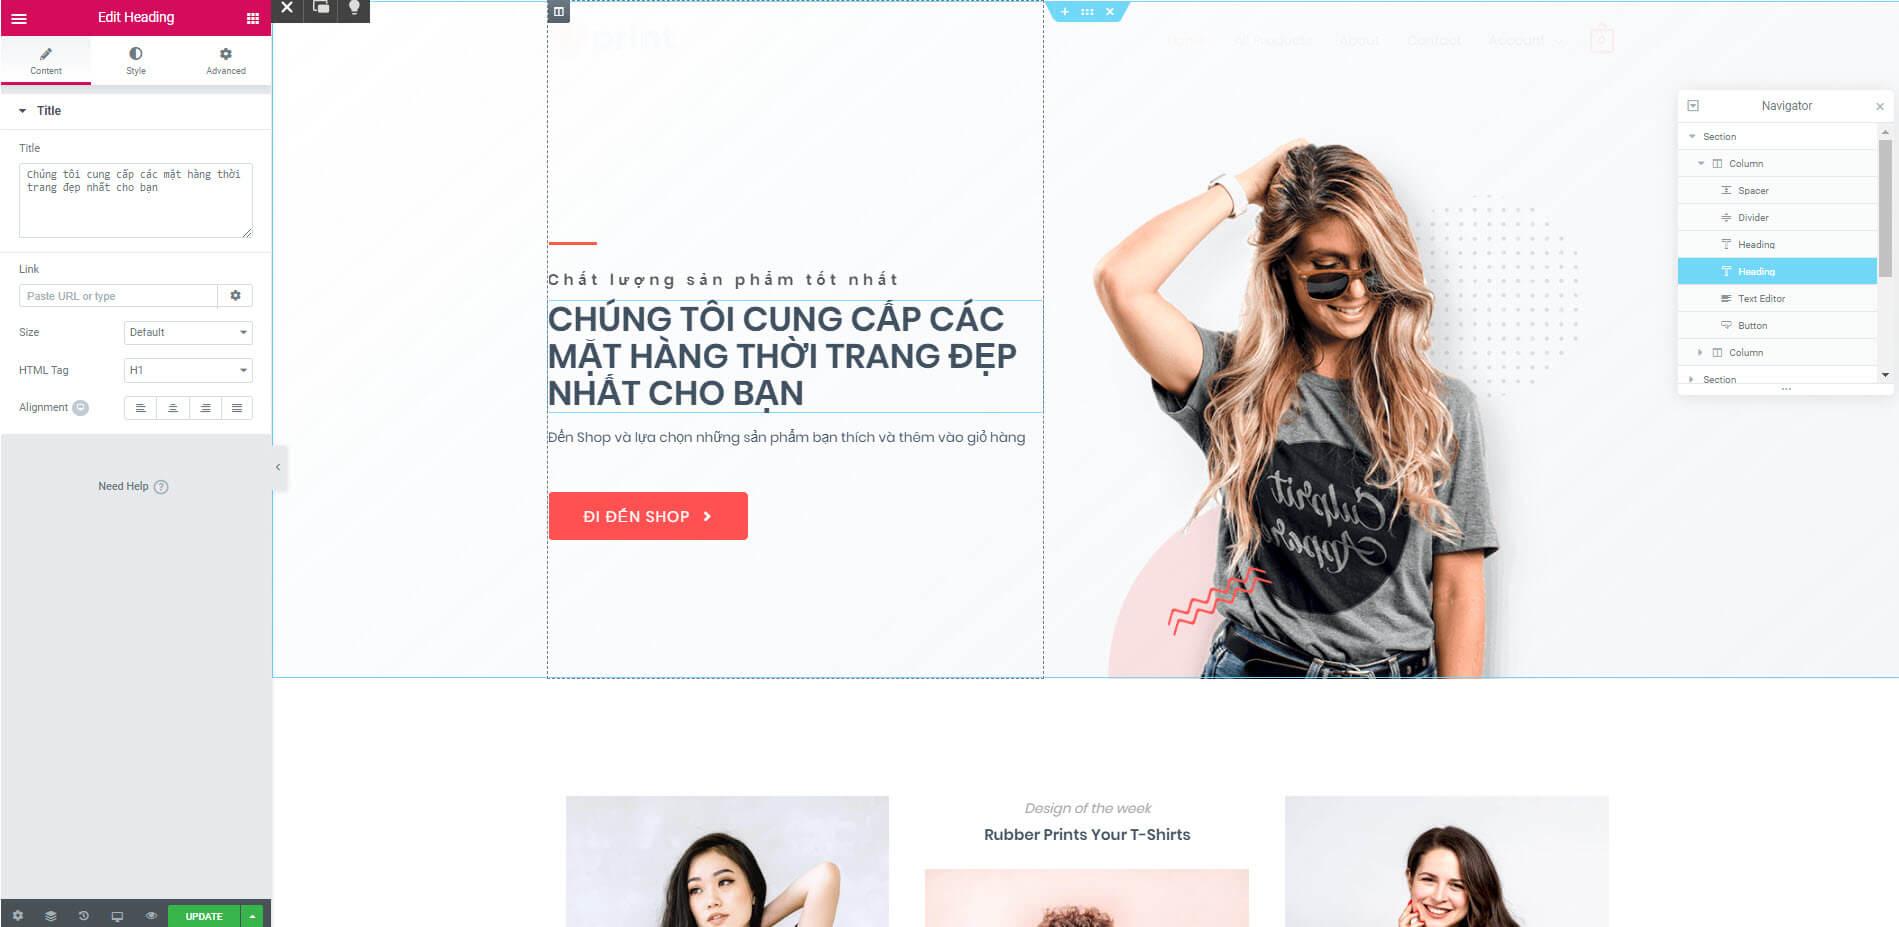 chinh-sua-viet-hoa-giao-dien-ban-hang